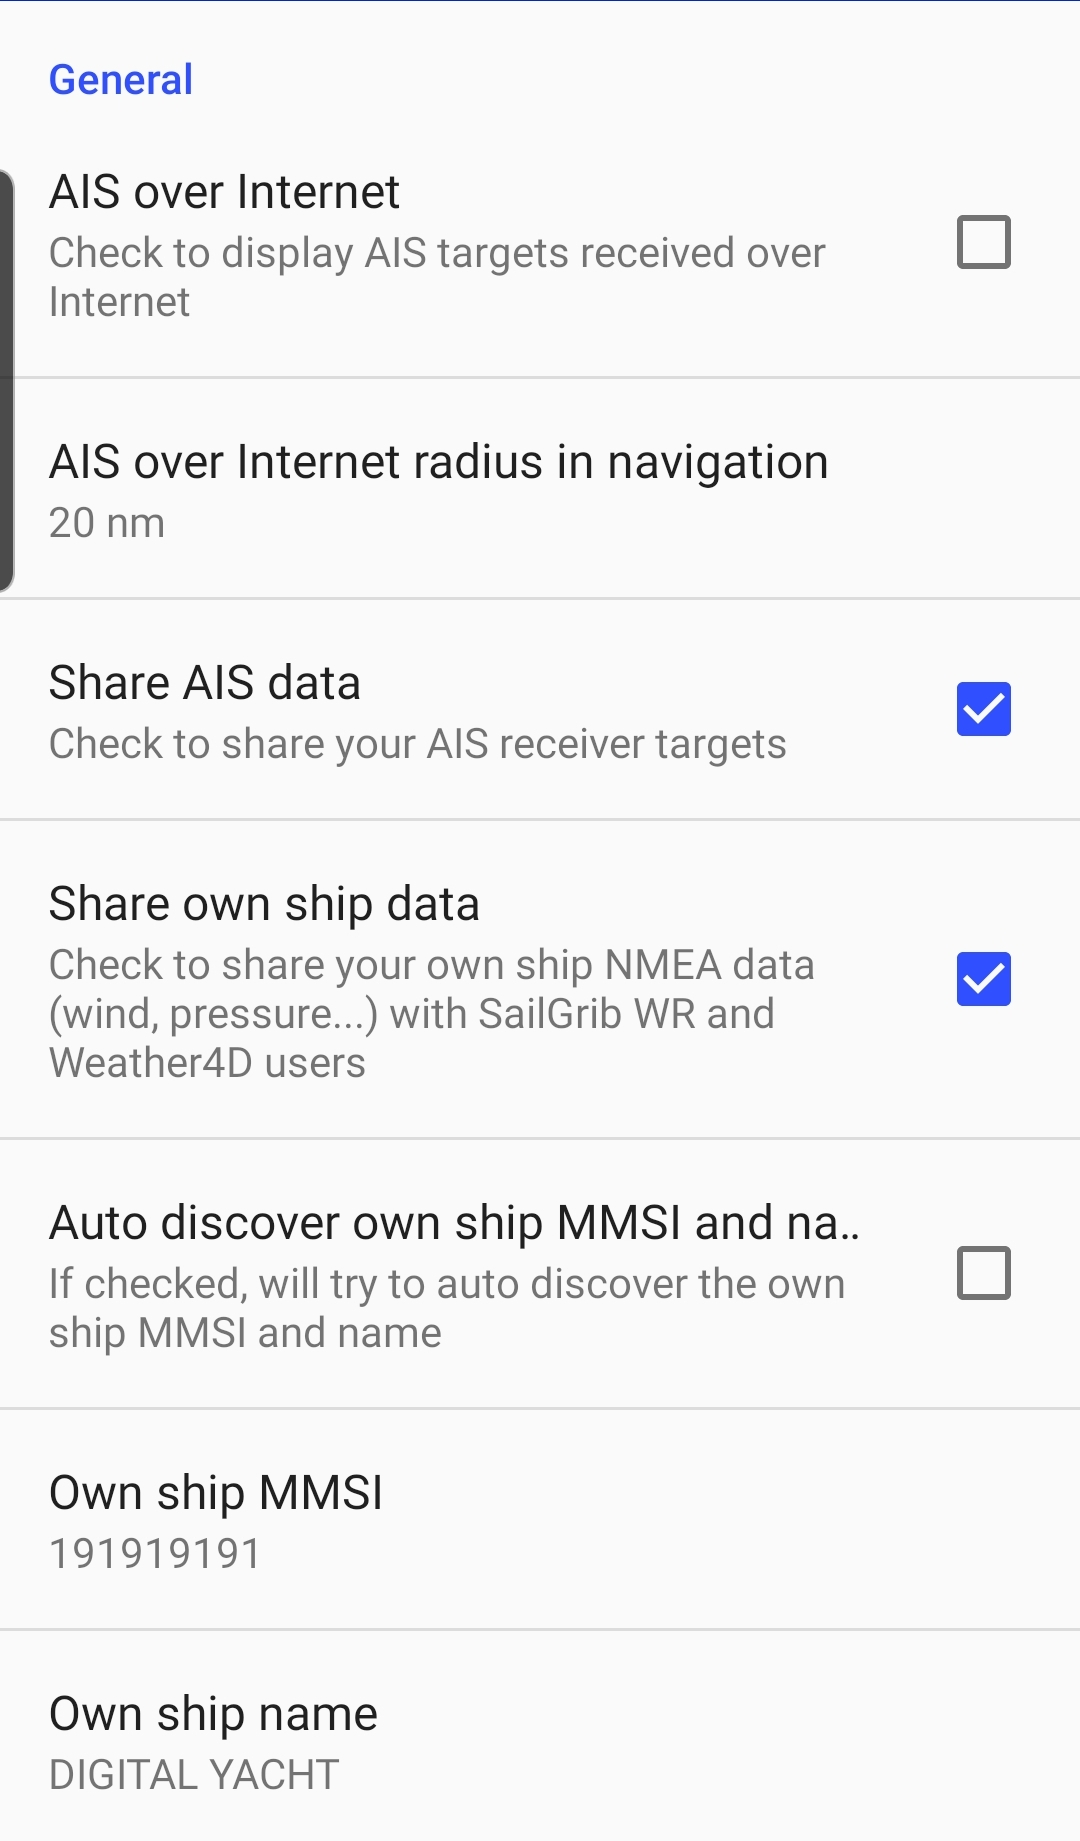 AIS settings in SailGrib